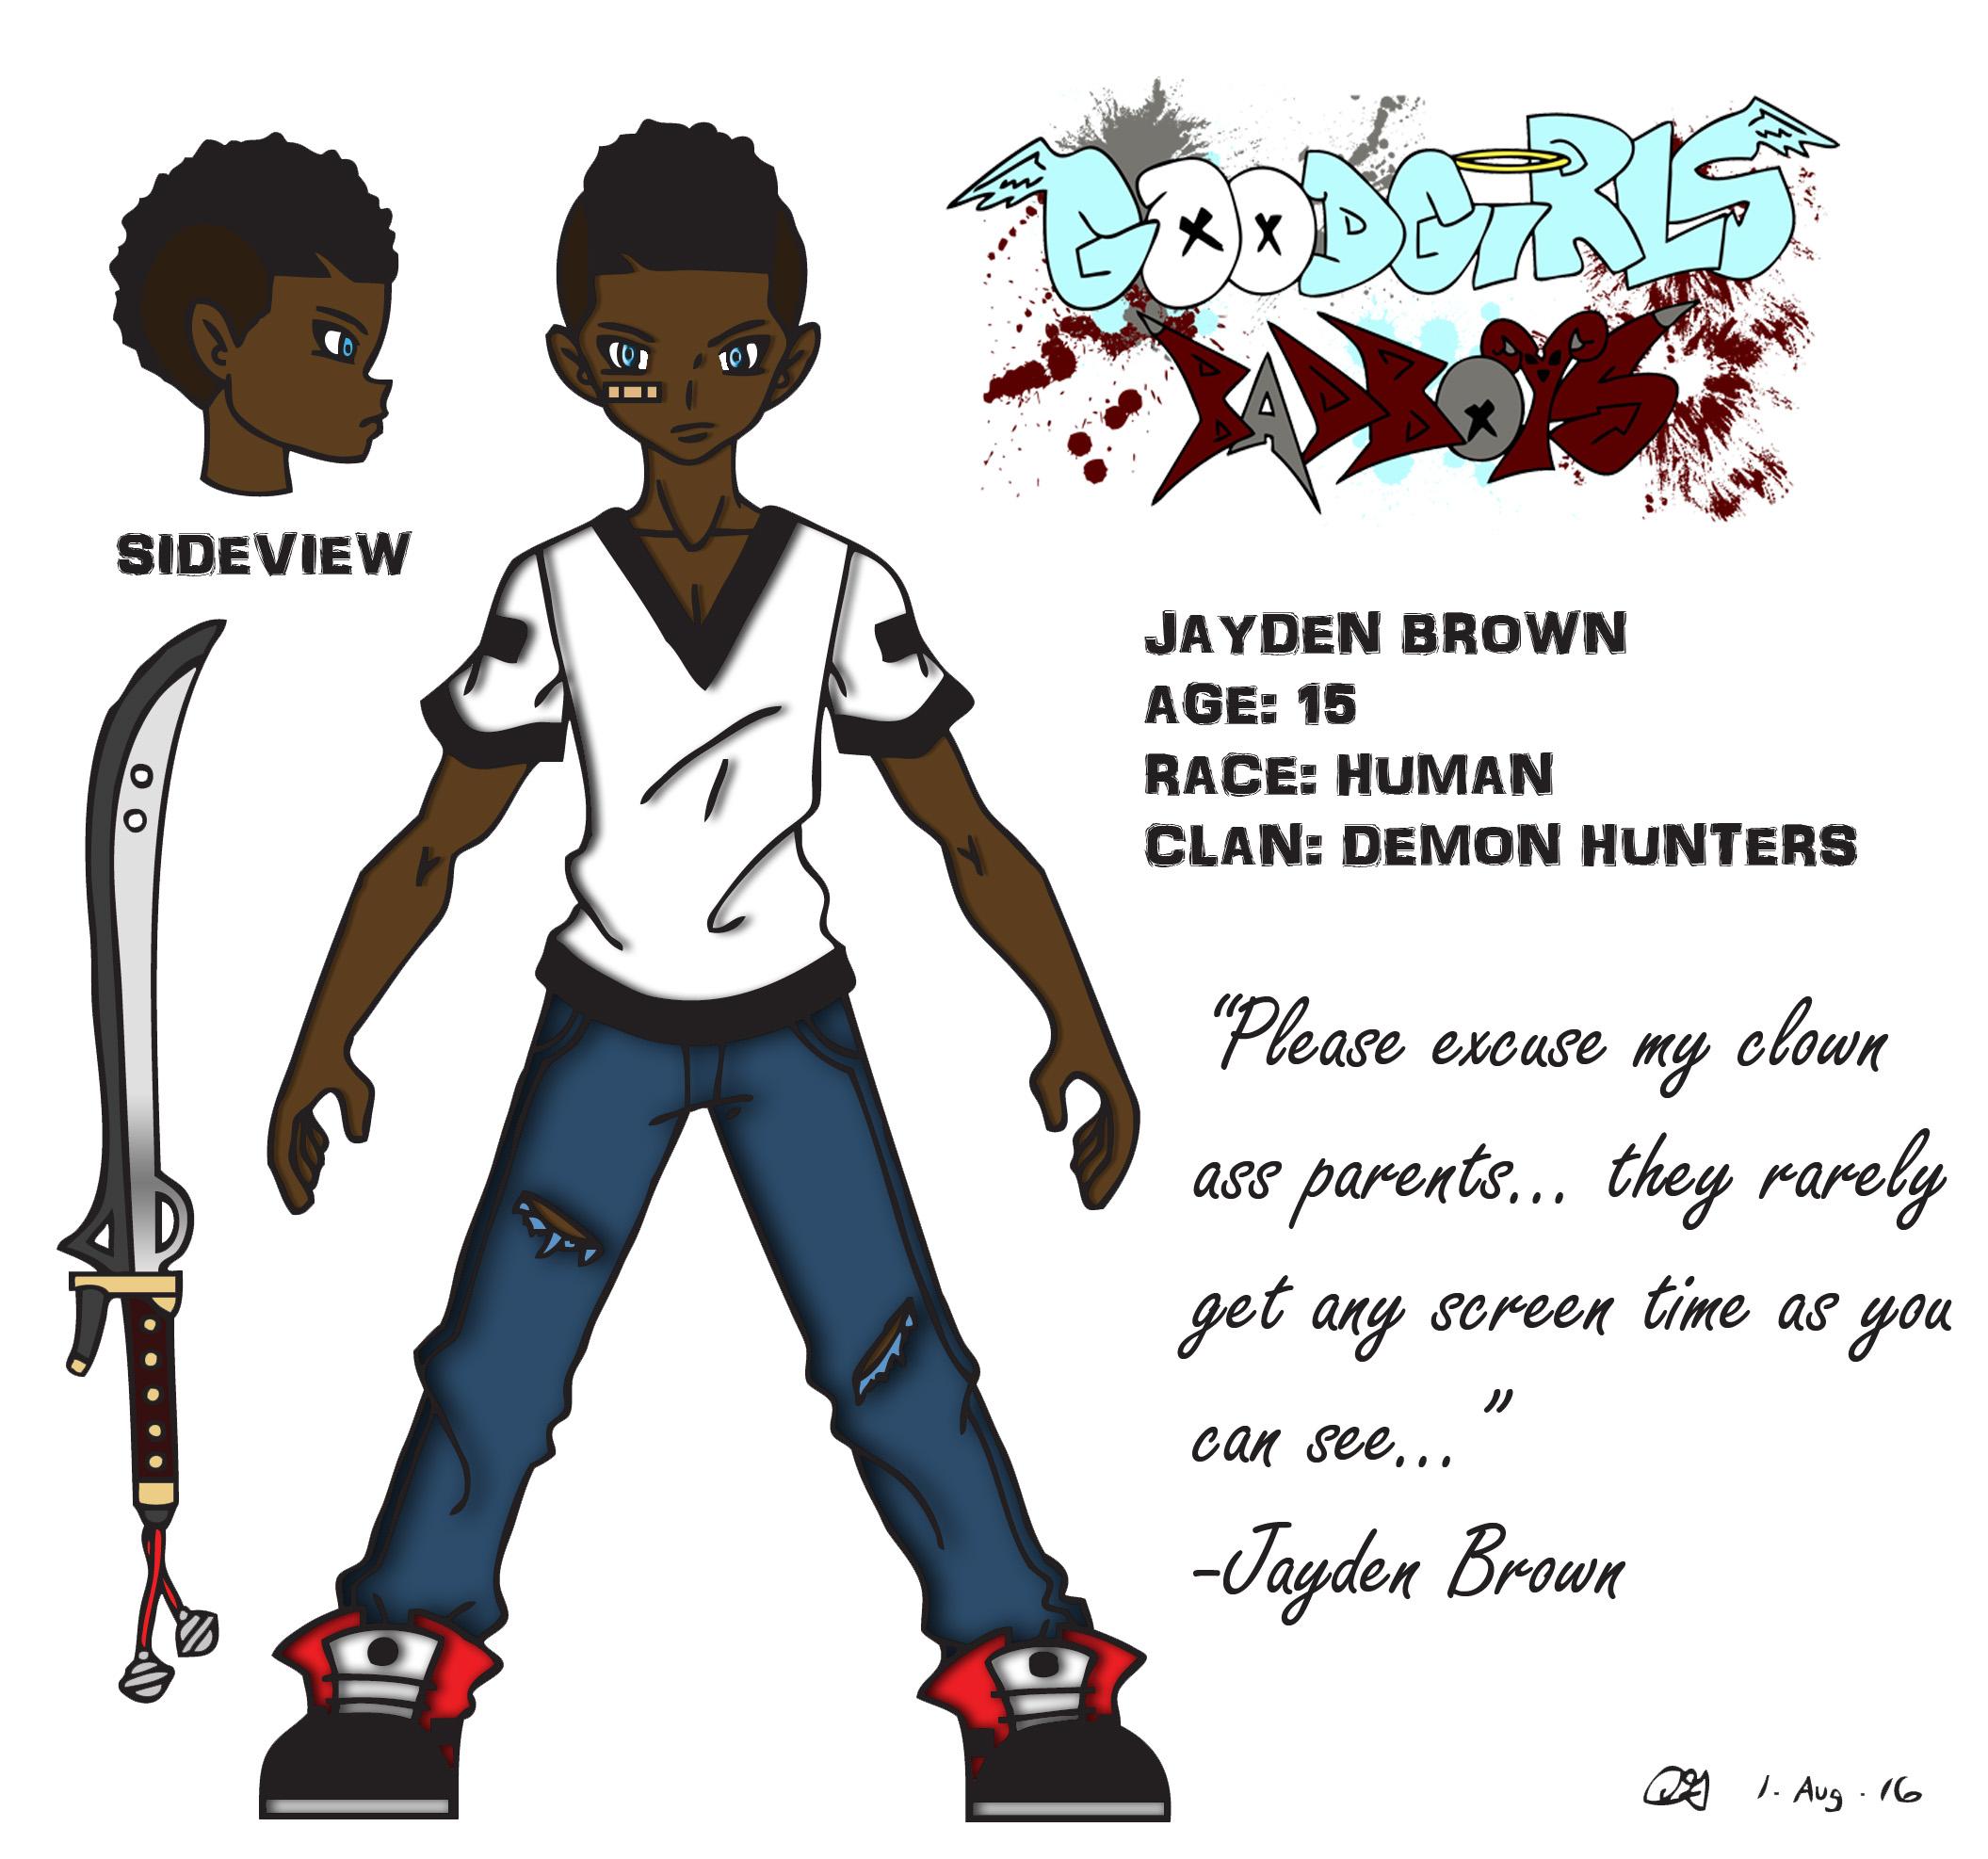 Jayden Brown Version 2